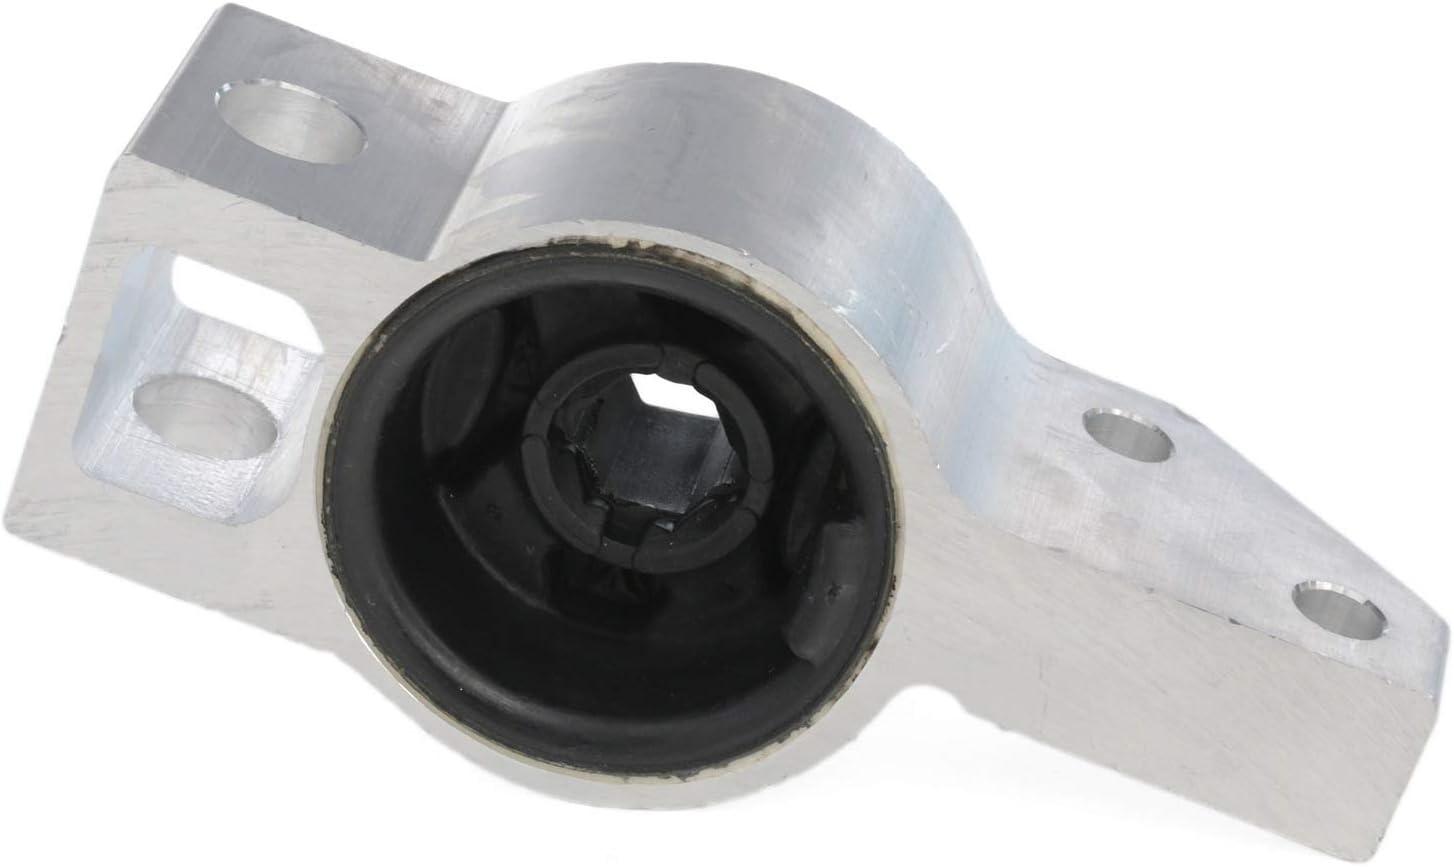 Delphi TD522W Suspension Control Arm Bushing